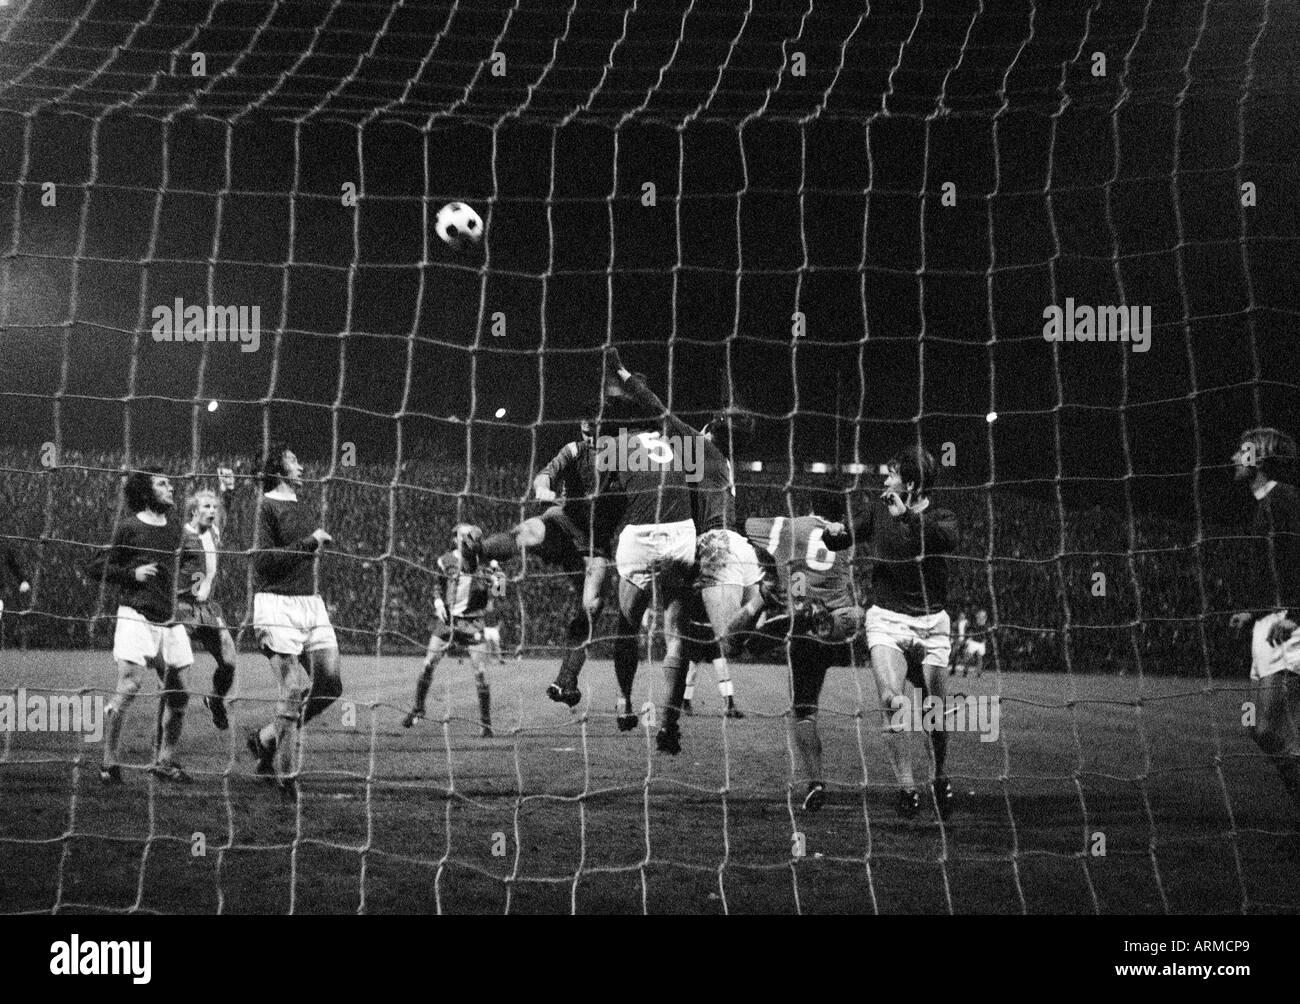 football, European Cup, eighth final, first leg, 1970/1971, Boekelberg Stadium in Moenchengladbach, Borussia Moenchengladbach versus FC Everton 1:1, scene of the match, Berti Vogts (MG) 2.f.l., Horst Koeppel (MG) 4.f.l., Herbert Laumen (MG) 5.f.l., keeper - Stock Image